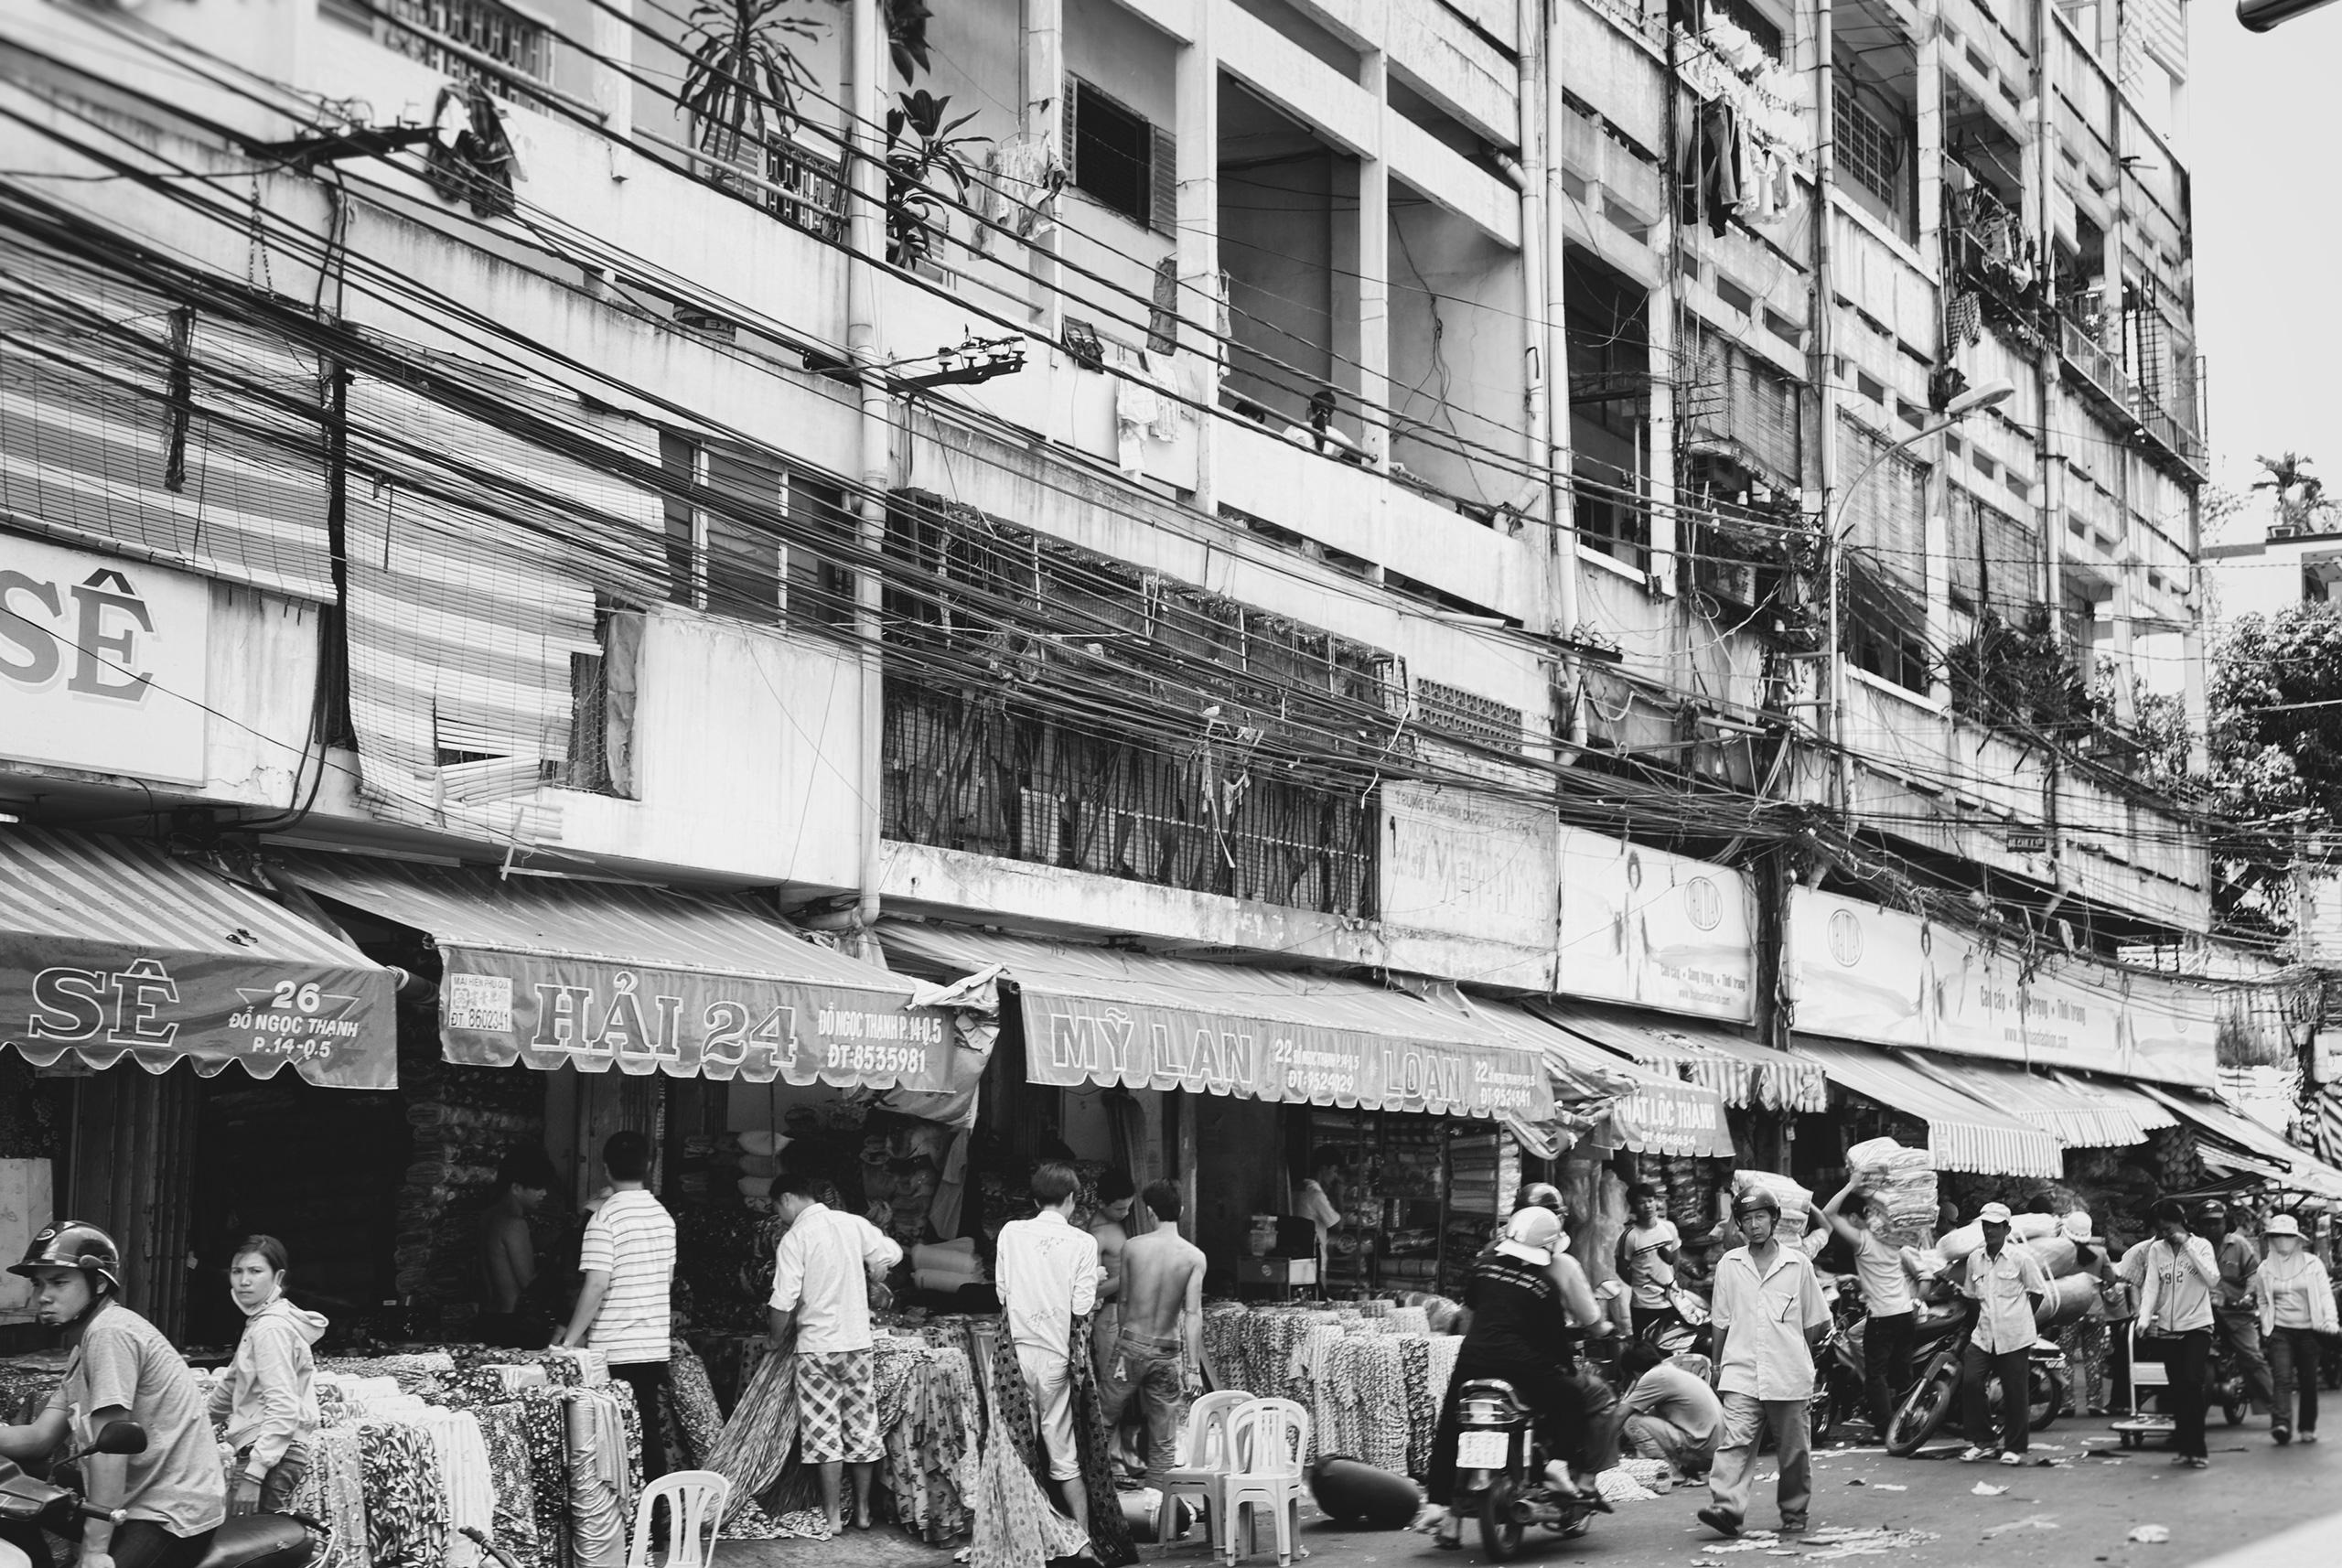 business busy - Saigon, Vietnam - christofkessemeier   ello